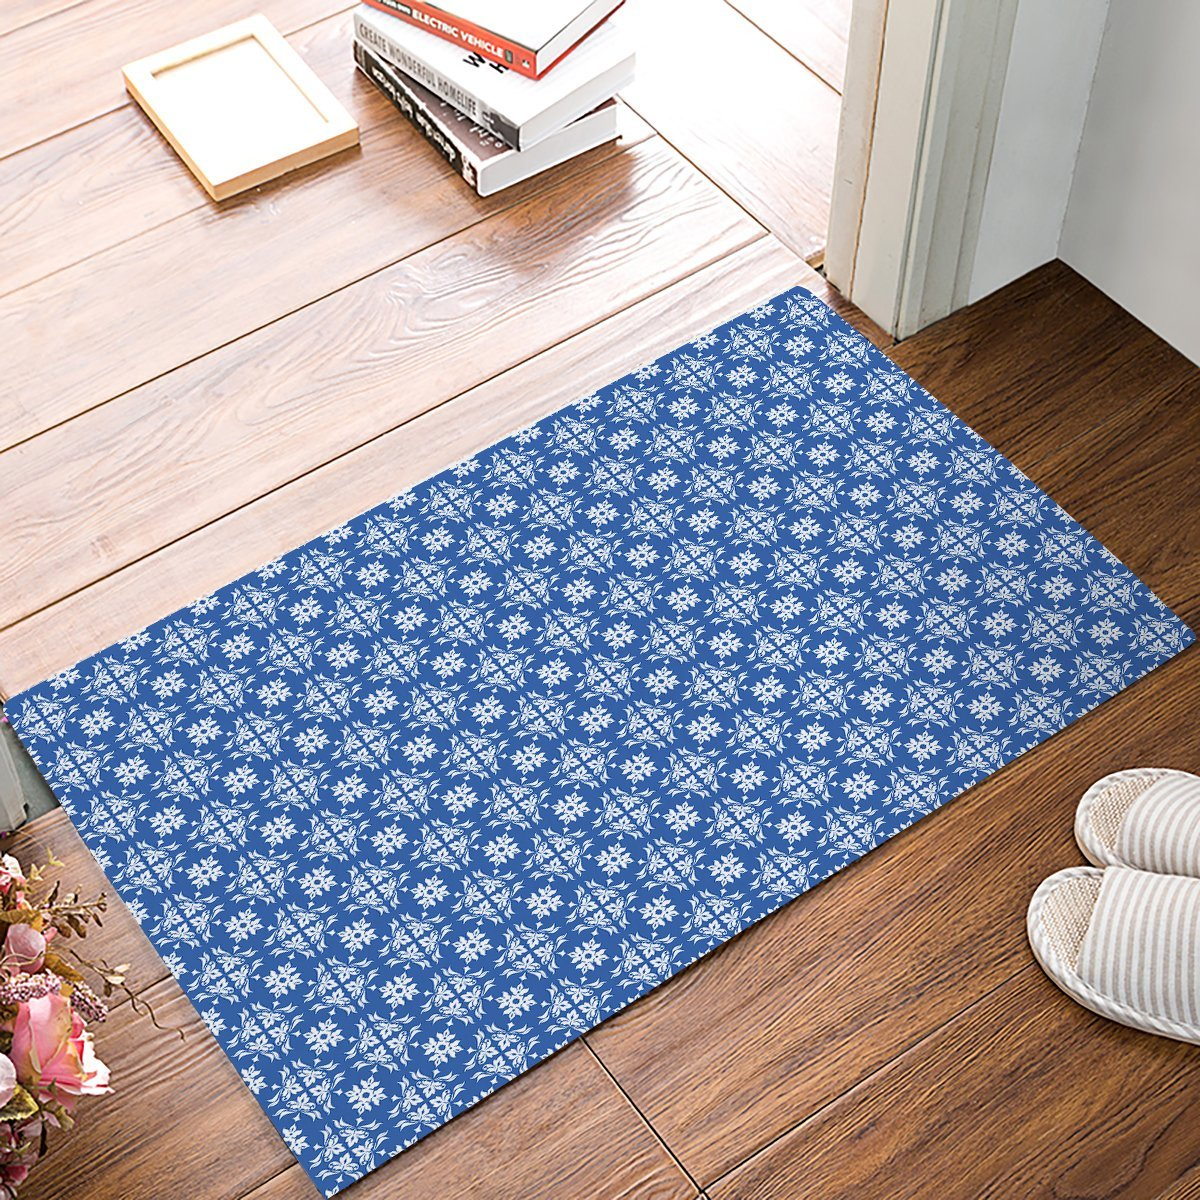 Blue Kitchen Floor Mats: Blue And White Classic Flower Pattern Door Mats Kitchen